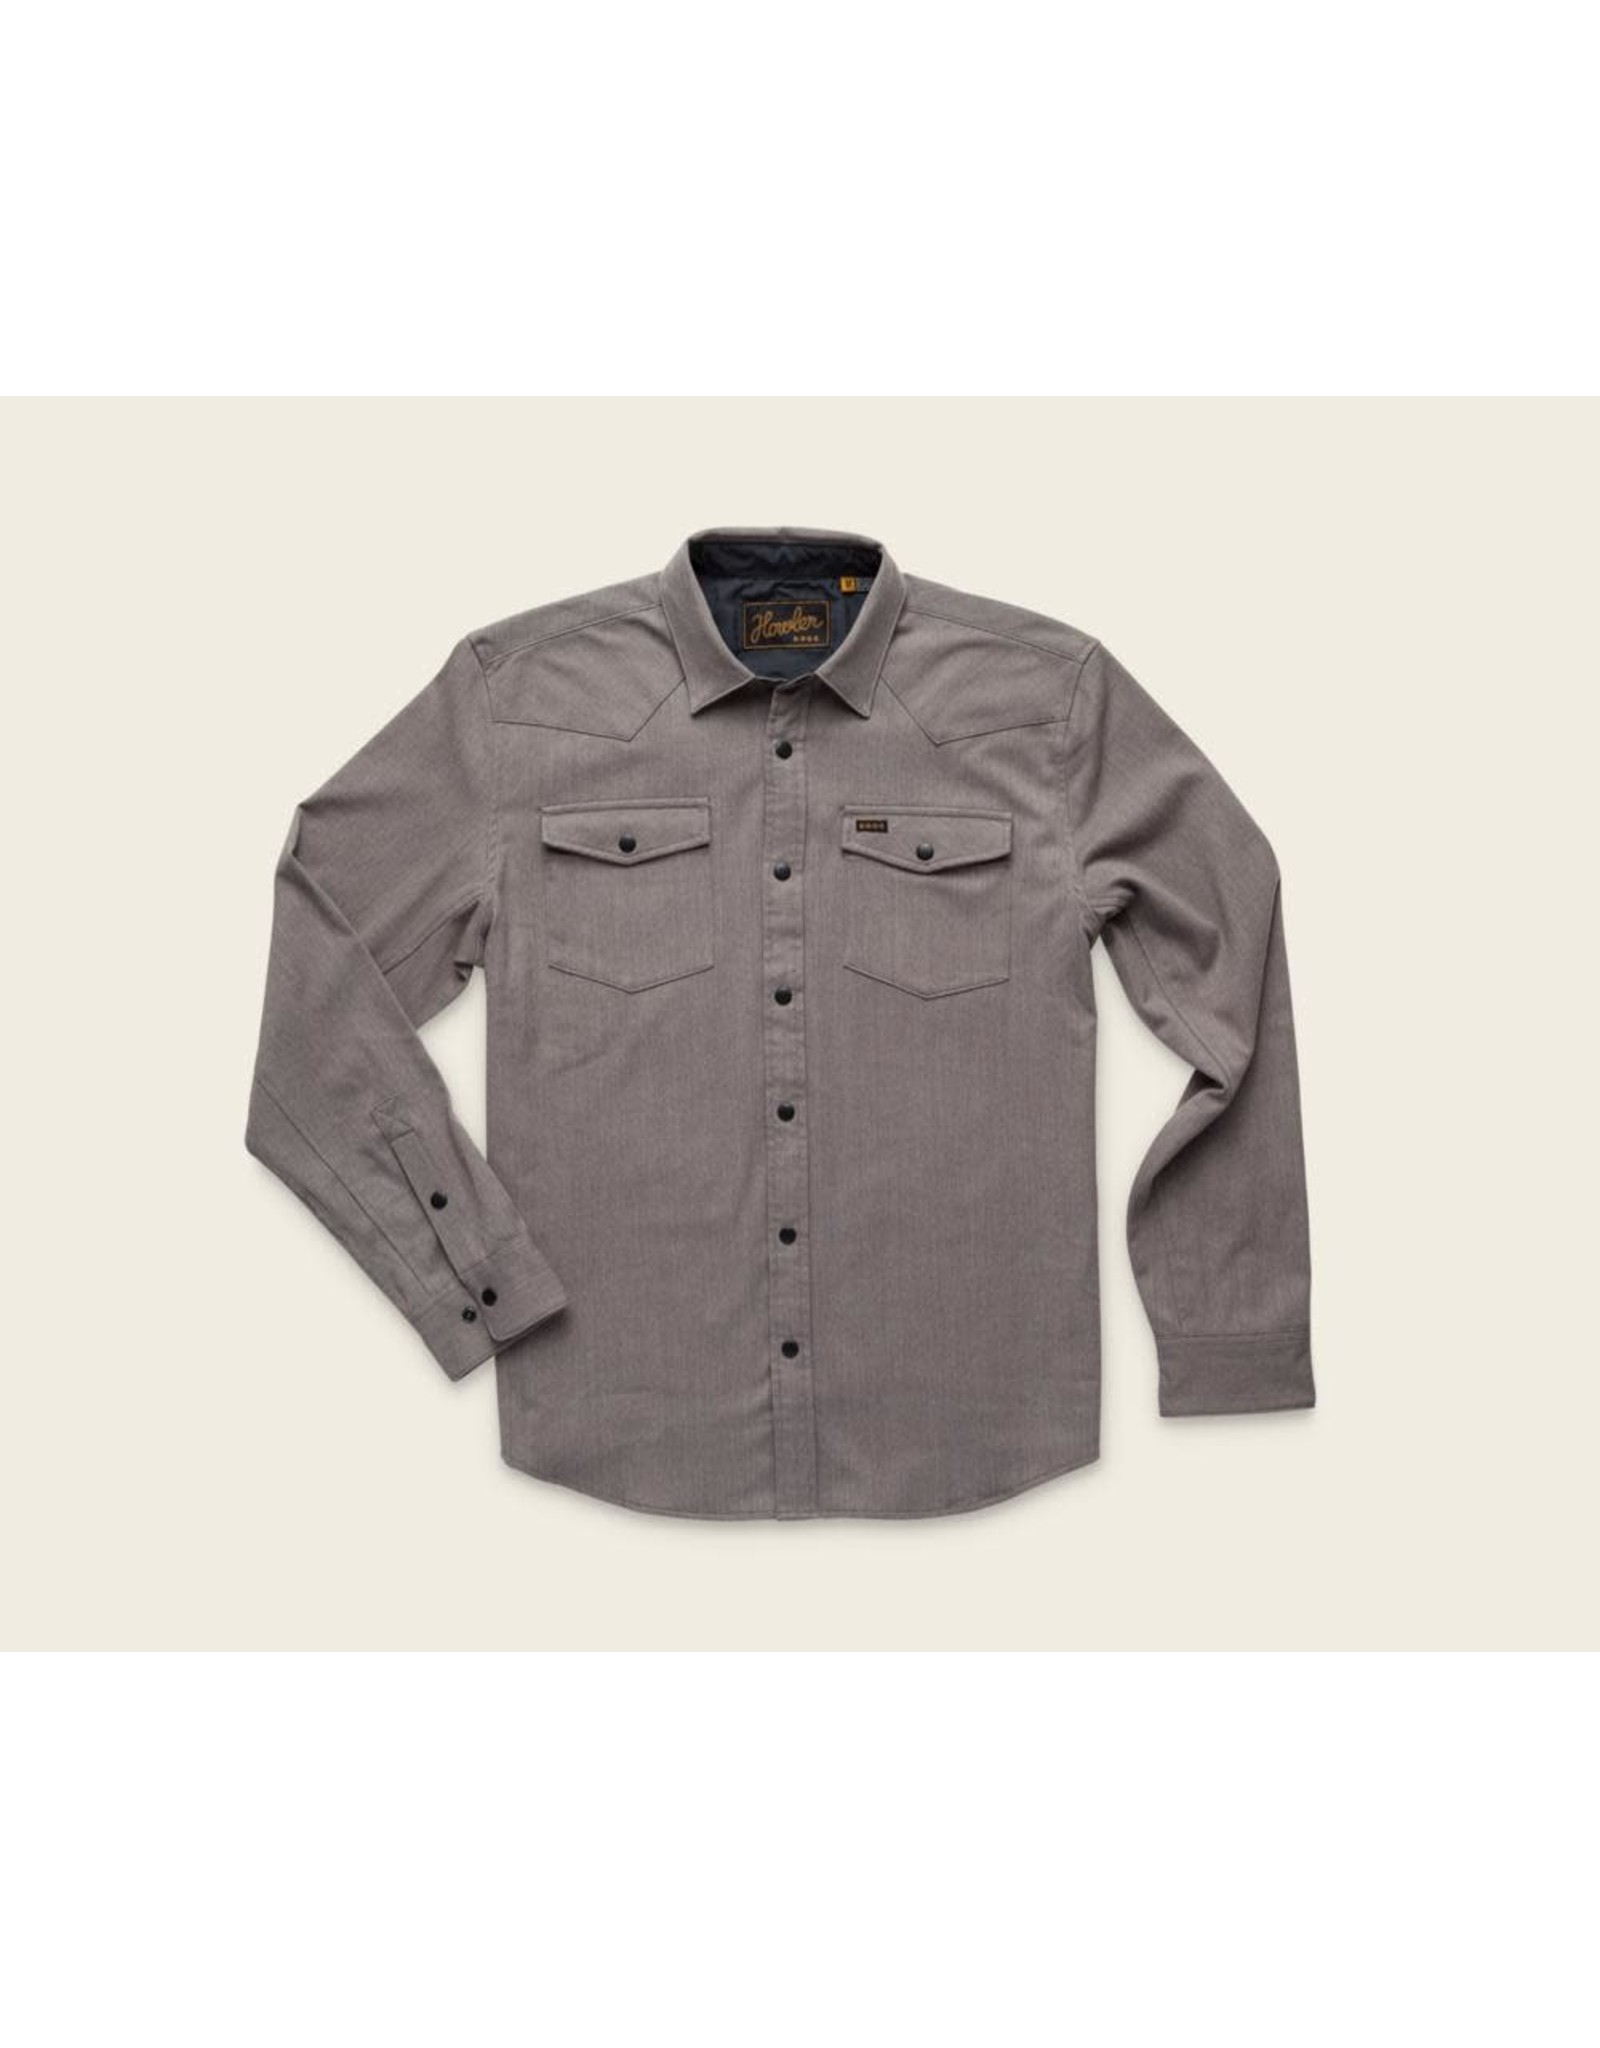 Howler Bros HB Stockman Stretch Snapshirt - Mountain Grey